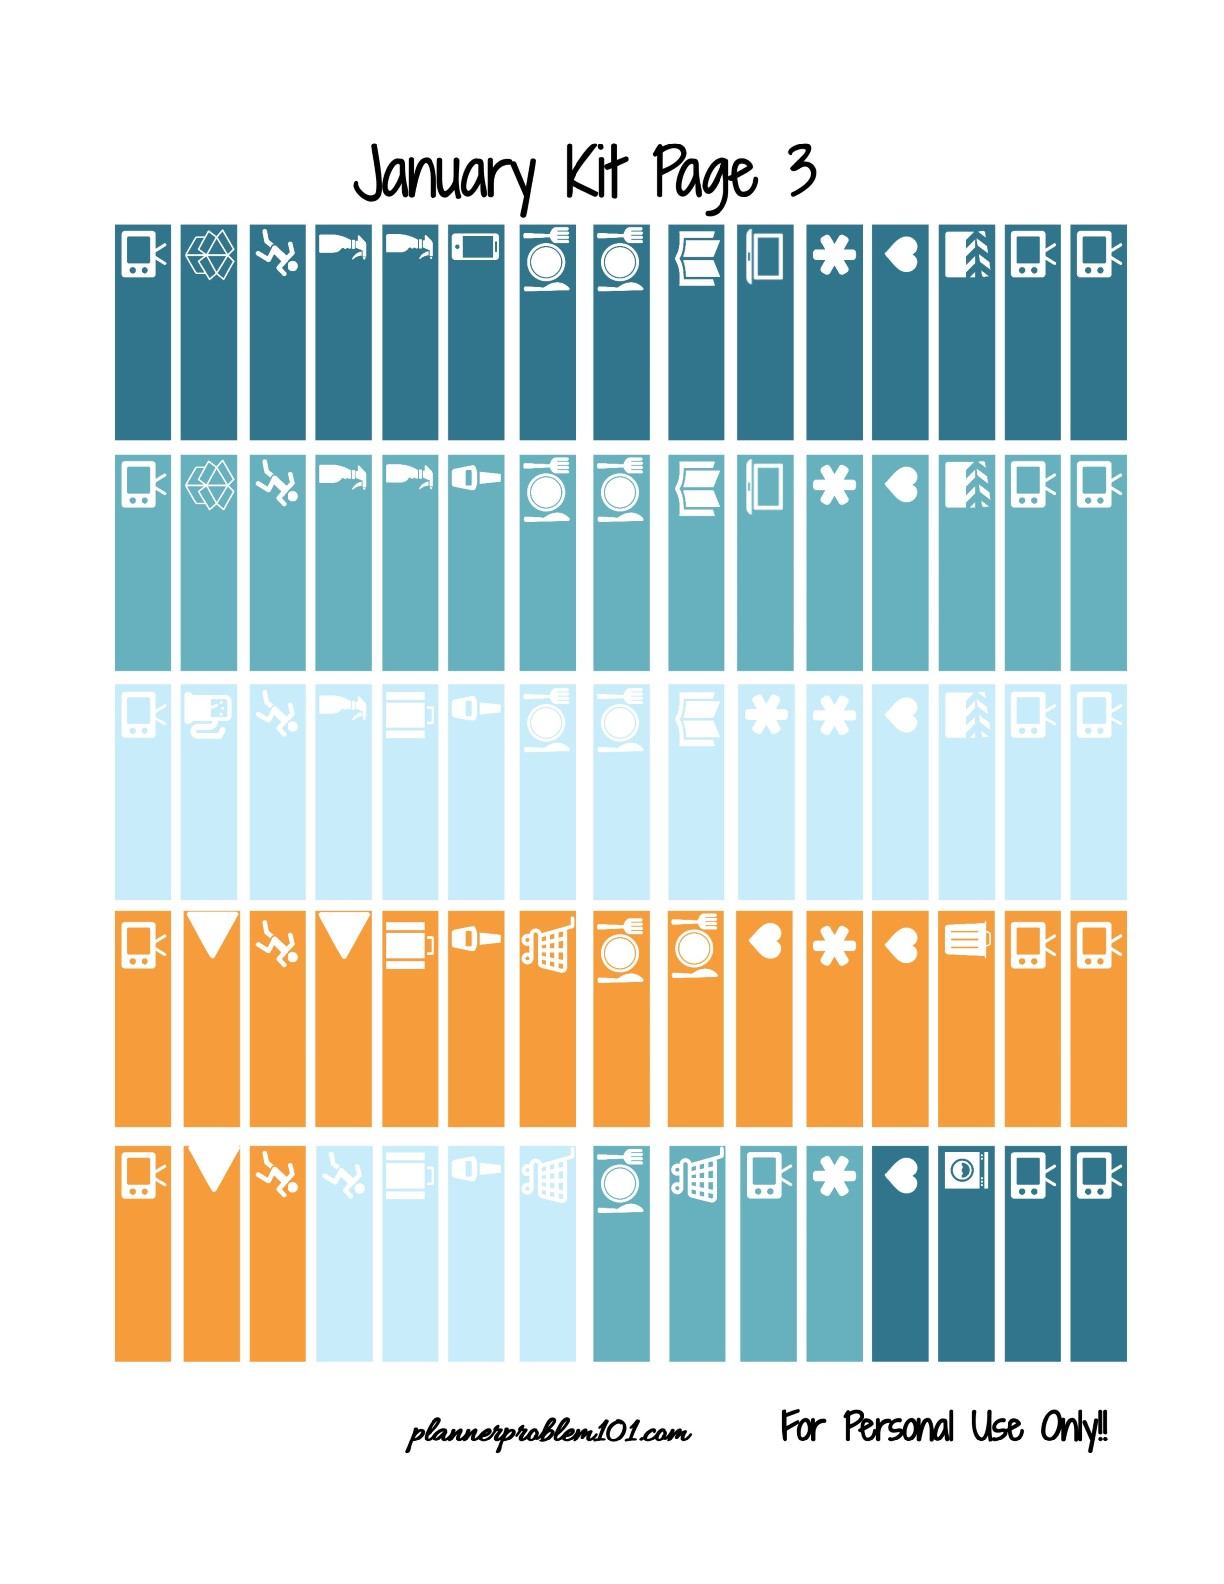 Free Printable Weekly Sticker Kit